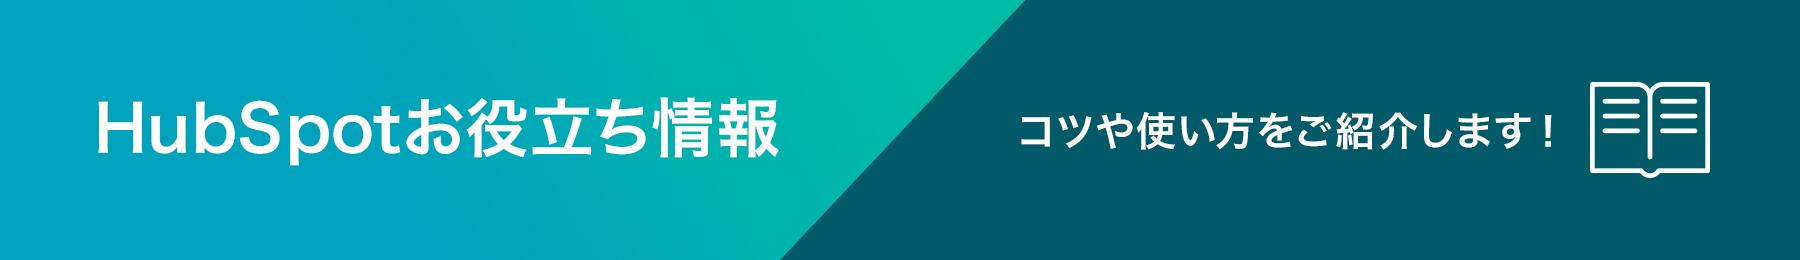 HubSpotお役立ち情報 コツや使い方をご紹介します